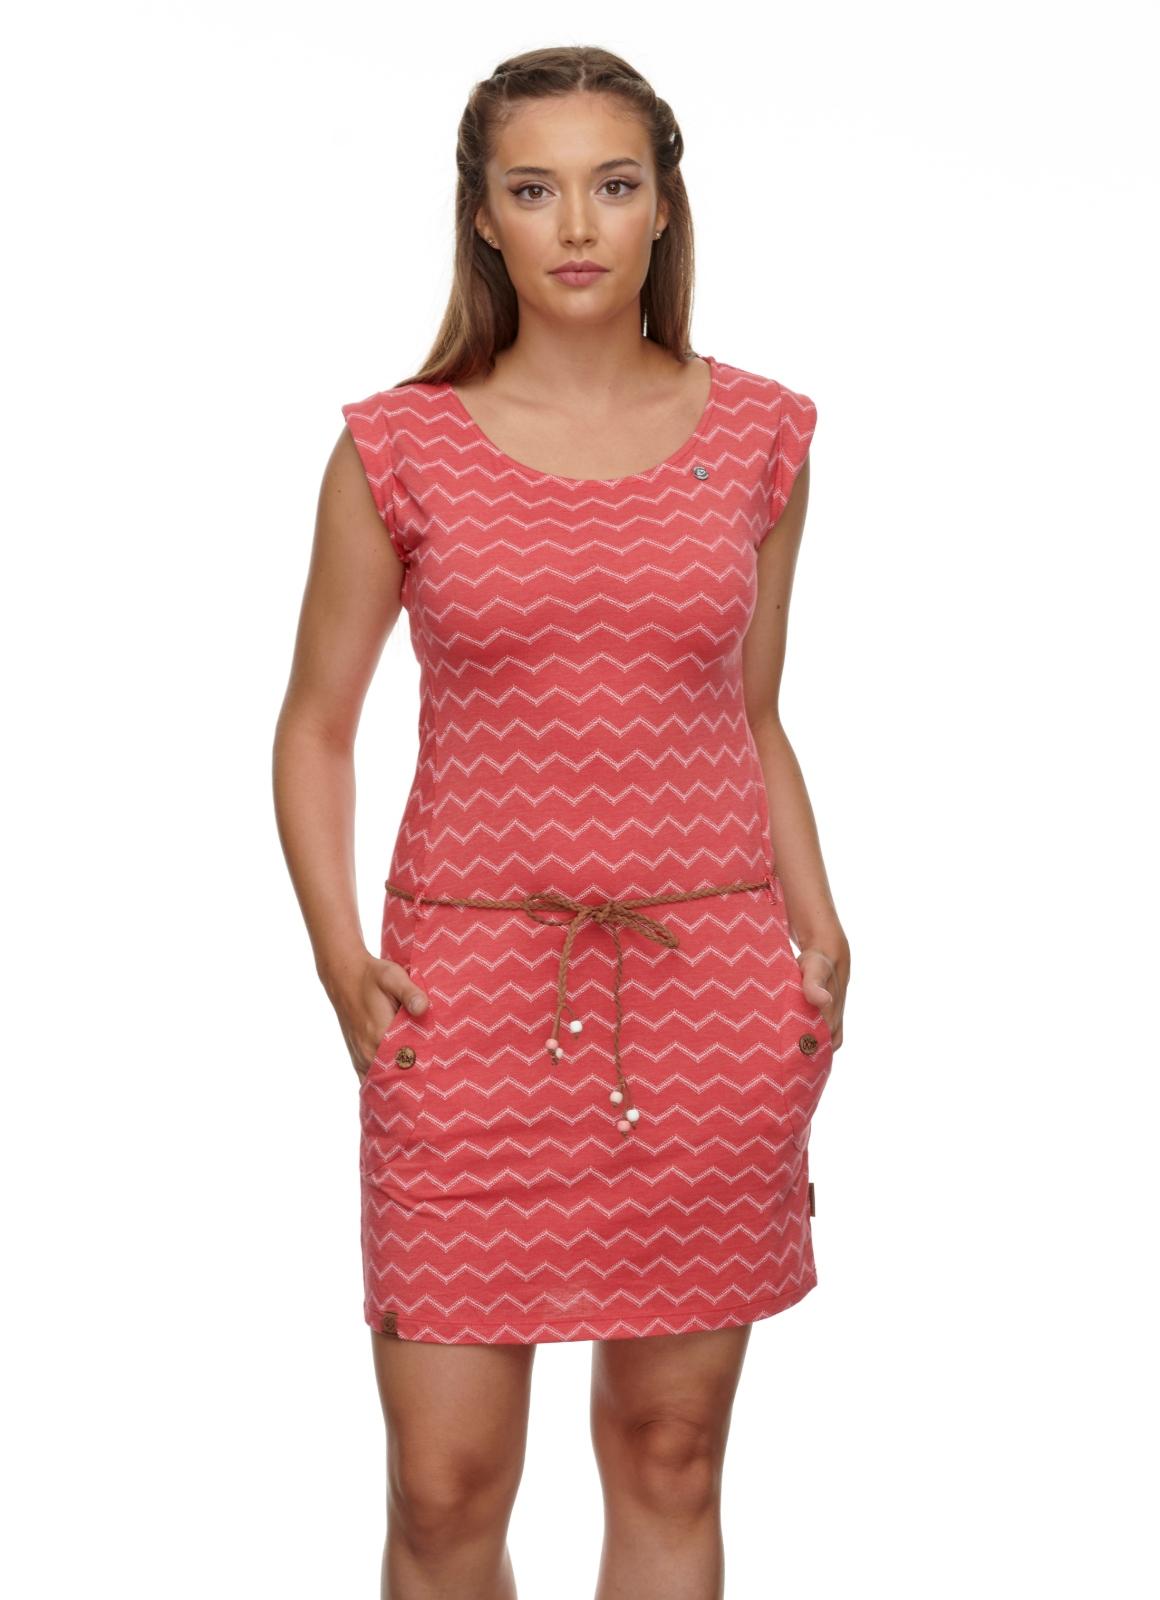 Ragwear Damen Kleid Tag Chevron rot weiß gemustert 2111 20016 4000 red